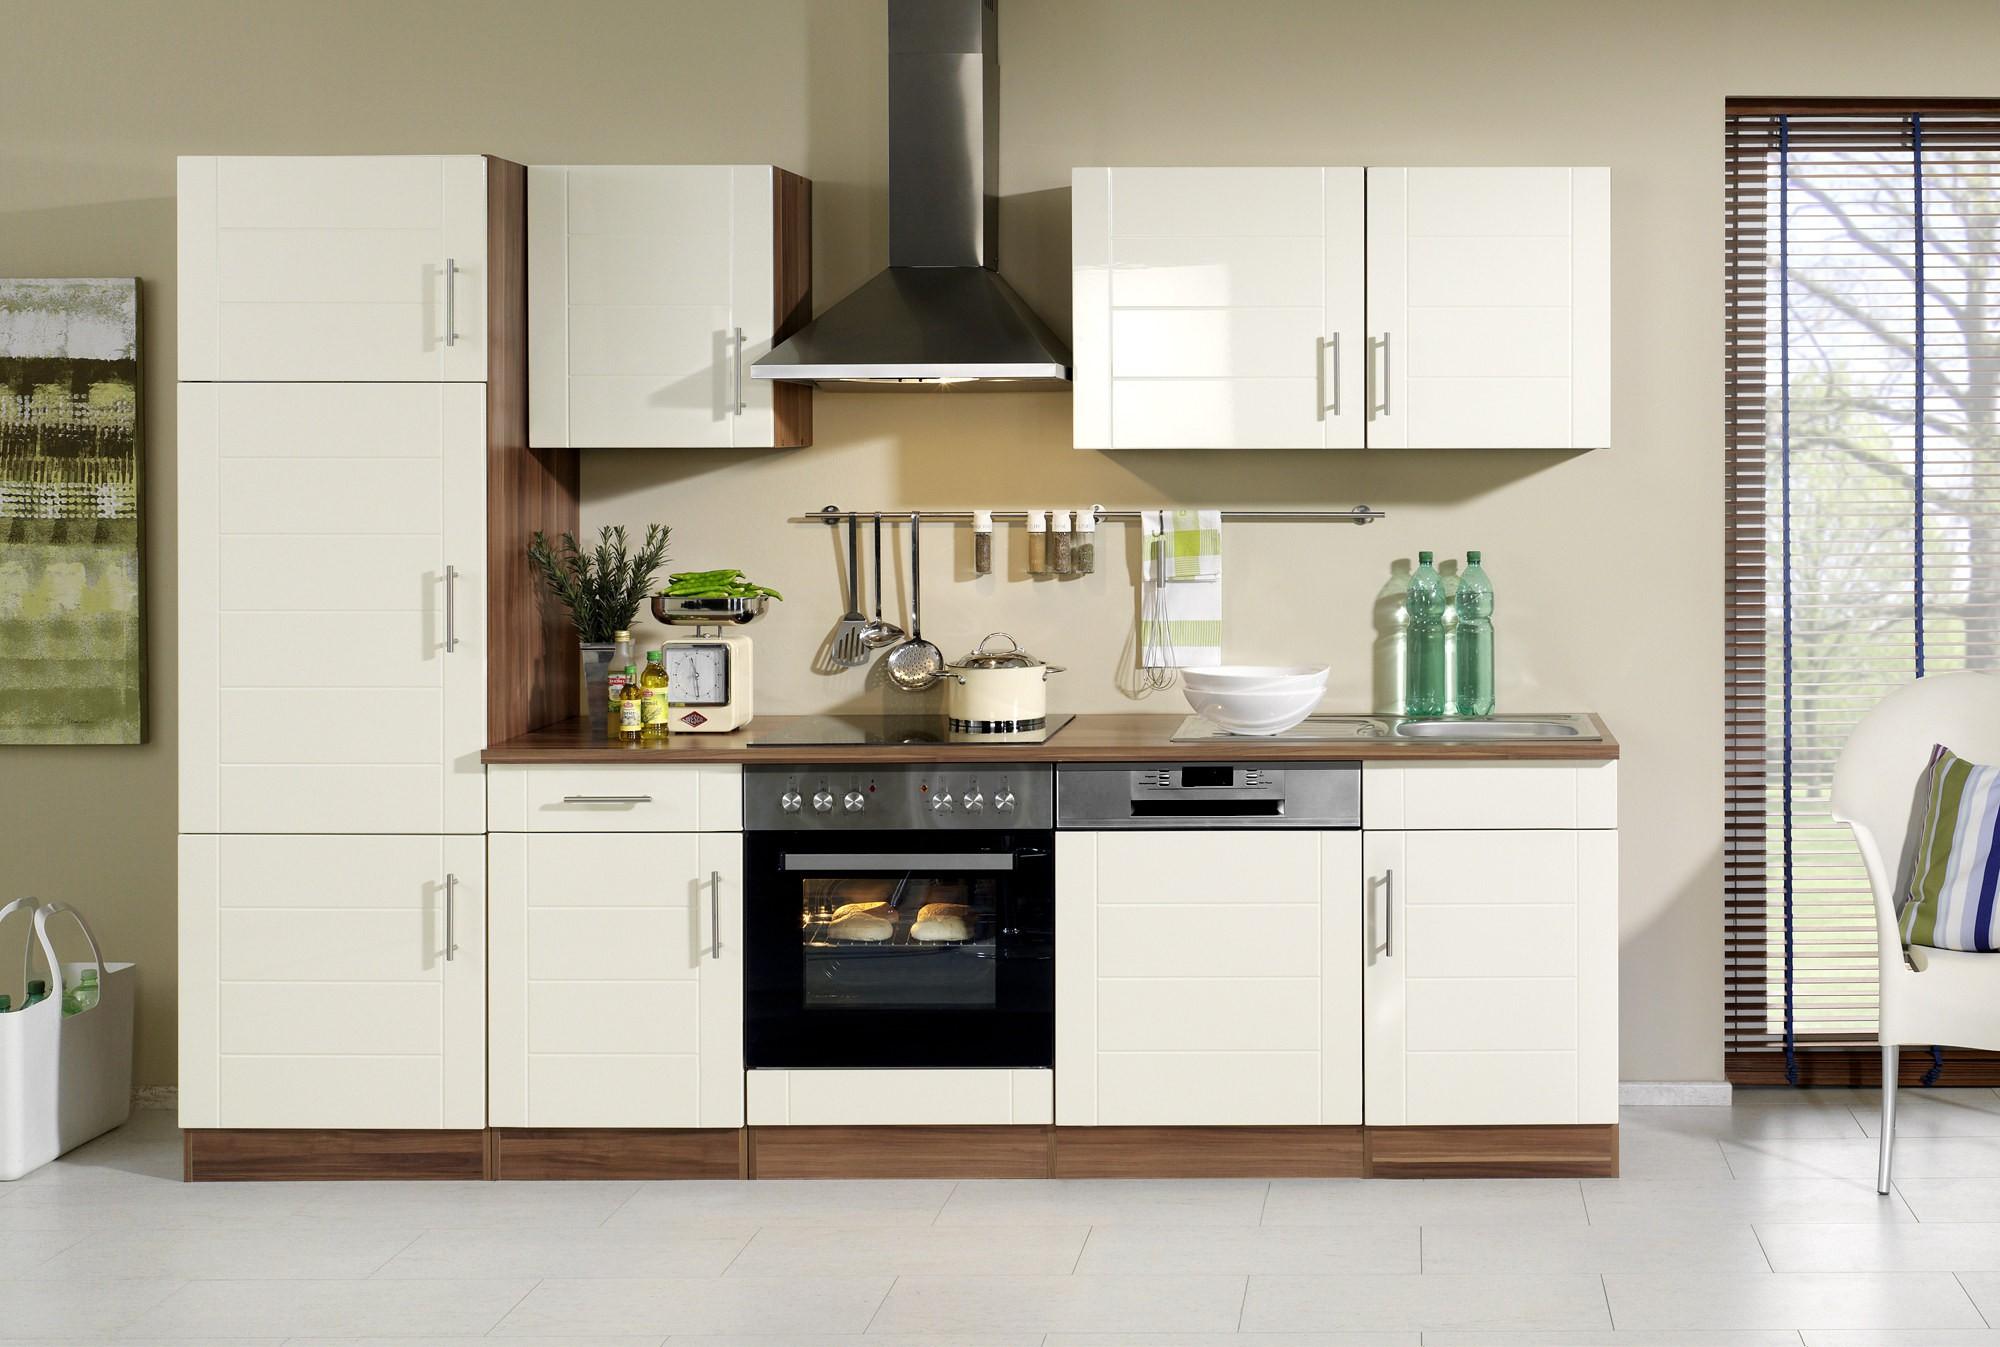 neu k chenzeile nevada k chenblock mit e ger ten 280 cm. Black Bedroom Furniture Sets. Home Design Ideas